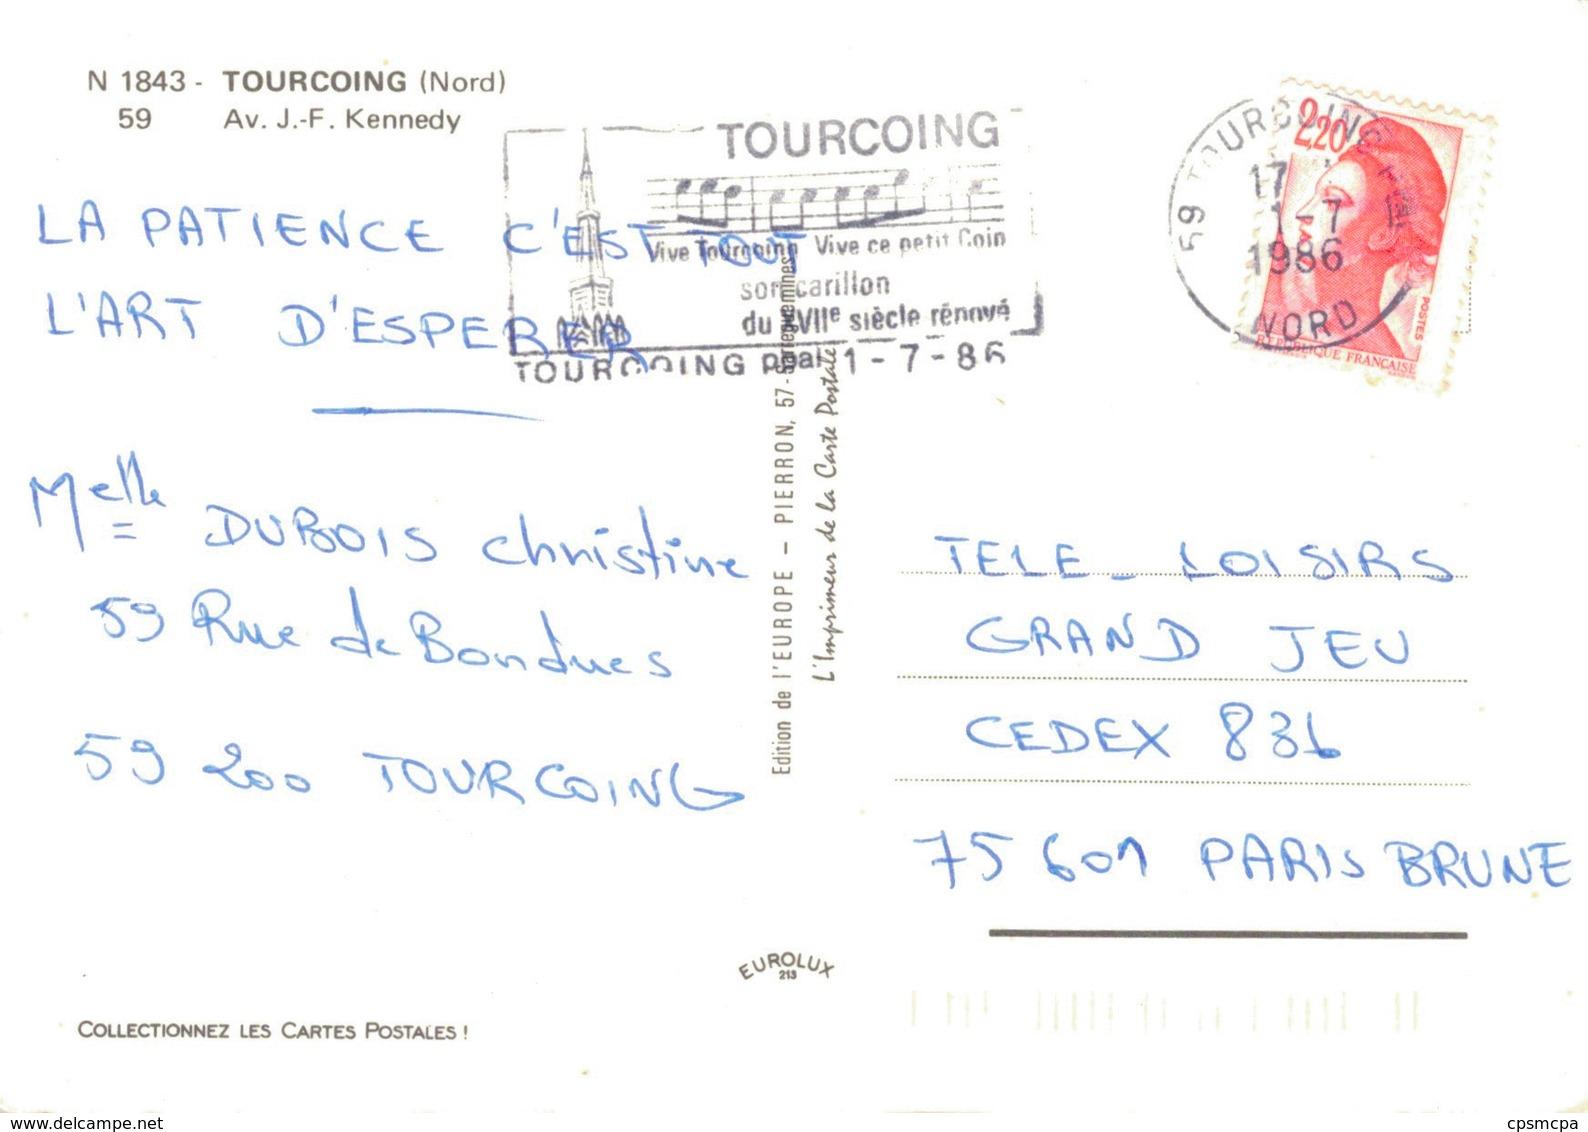 59 - TOURCOING / AVENUE JOHN FITZERALD KENNEDY - Tourcoing